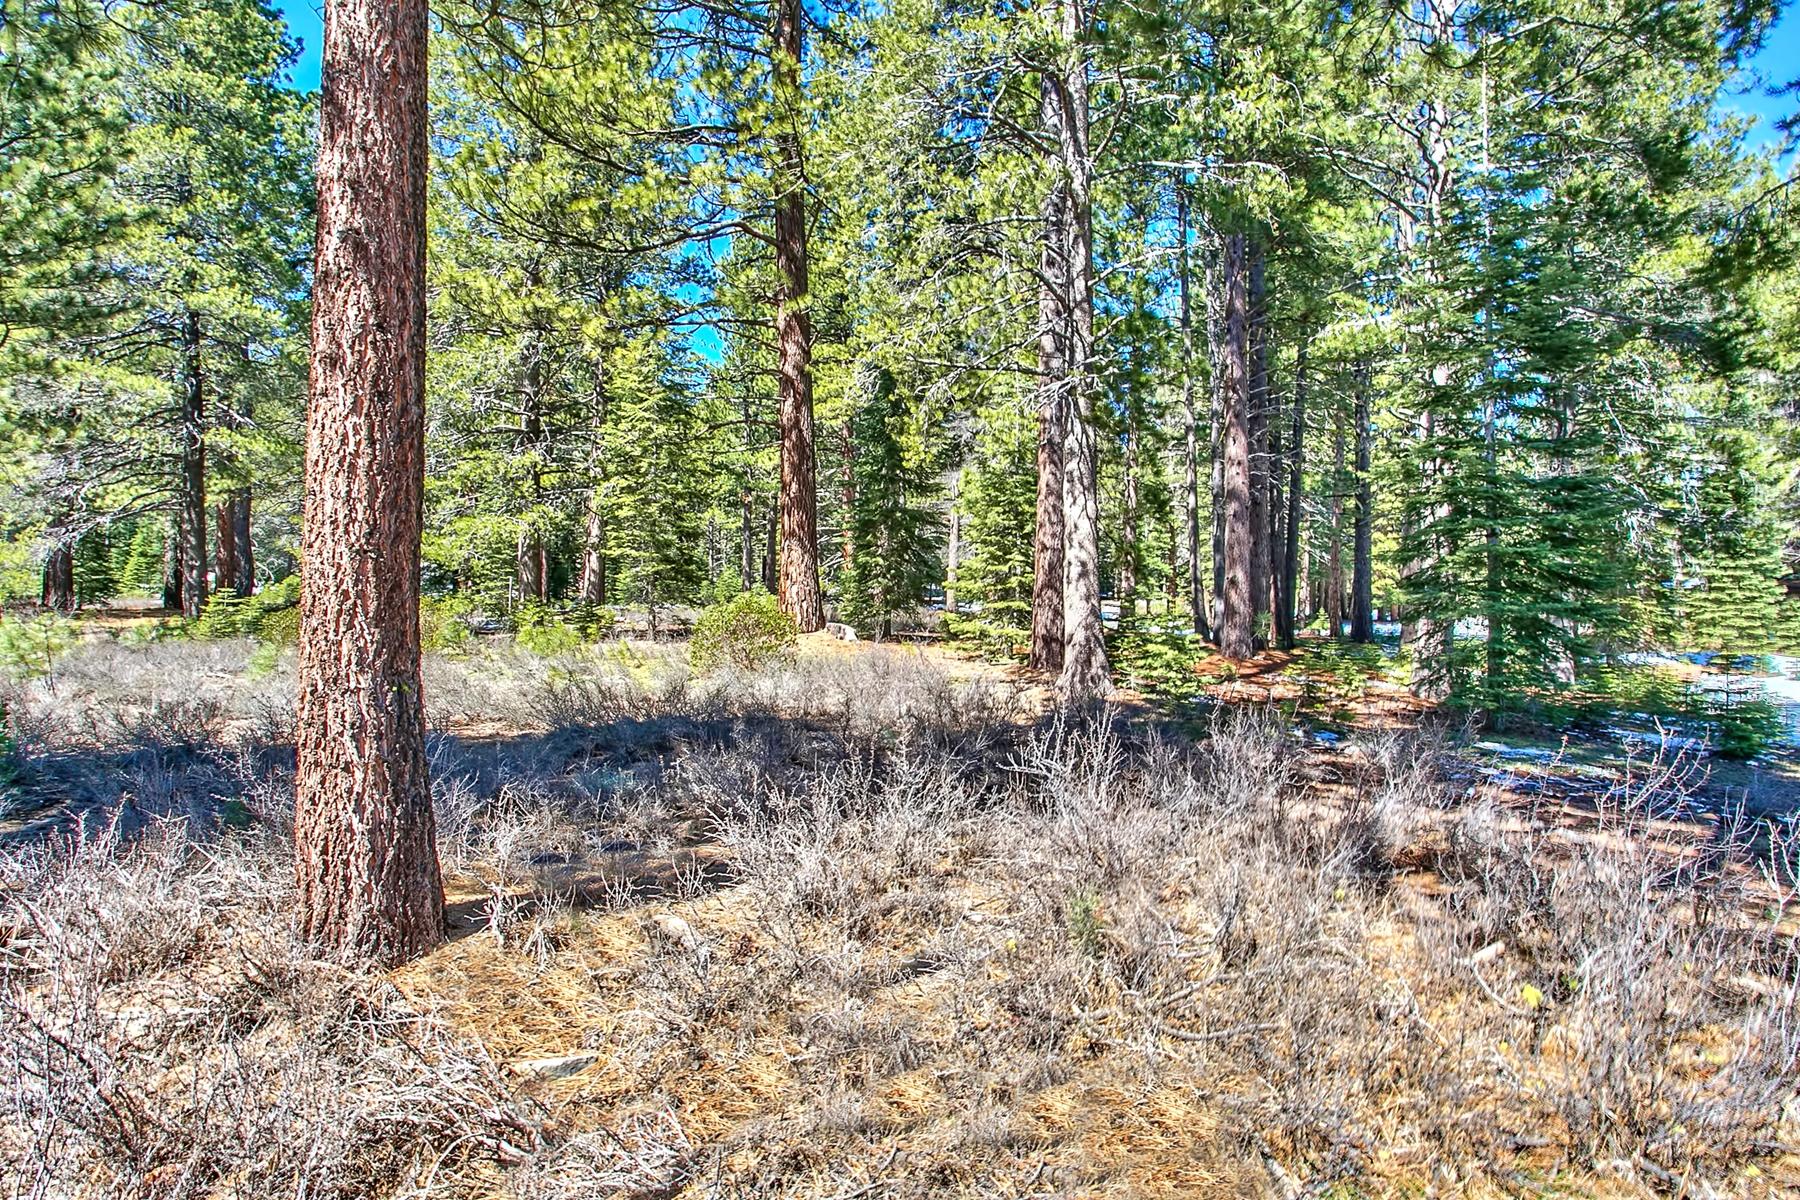 Additional photo for property listing at 11830 Bottcher Loop W57 11830 Bottcher Loop W57 特拉基, 加利福尼亚州 96161 美国